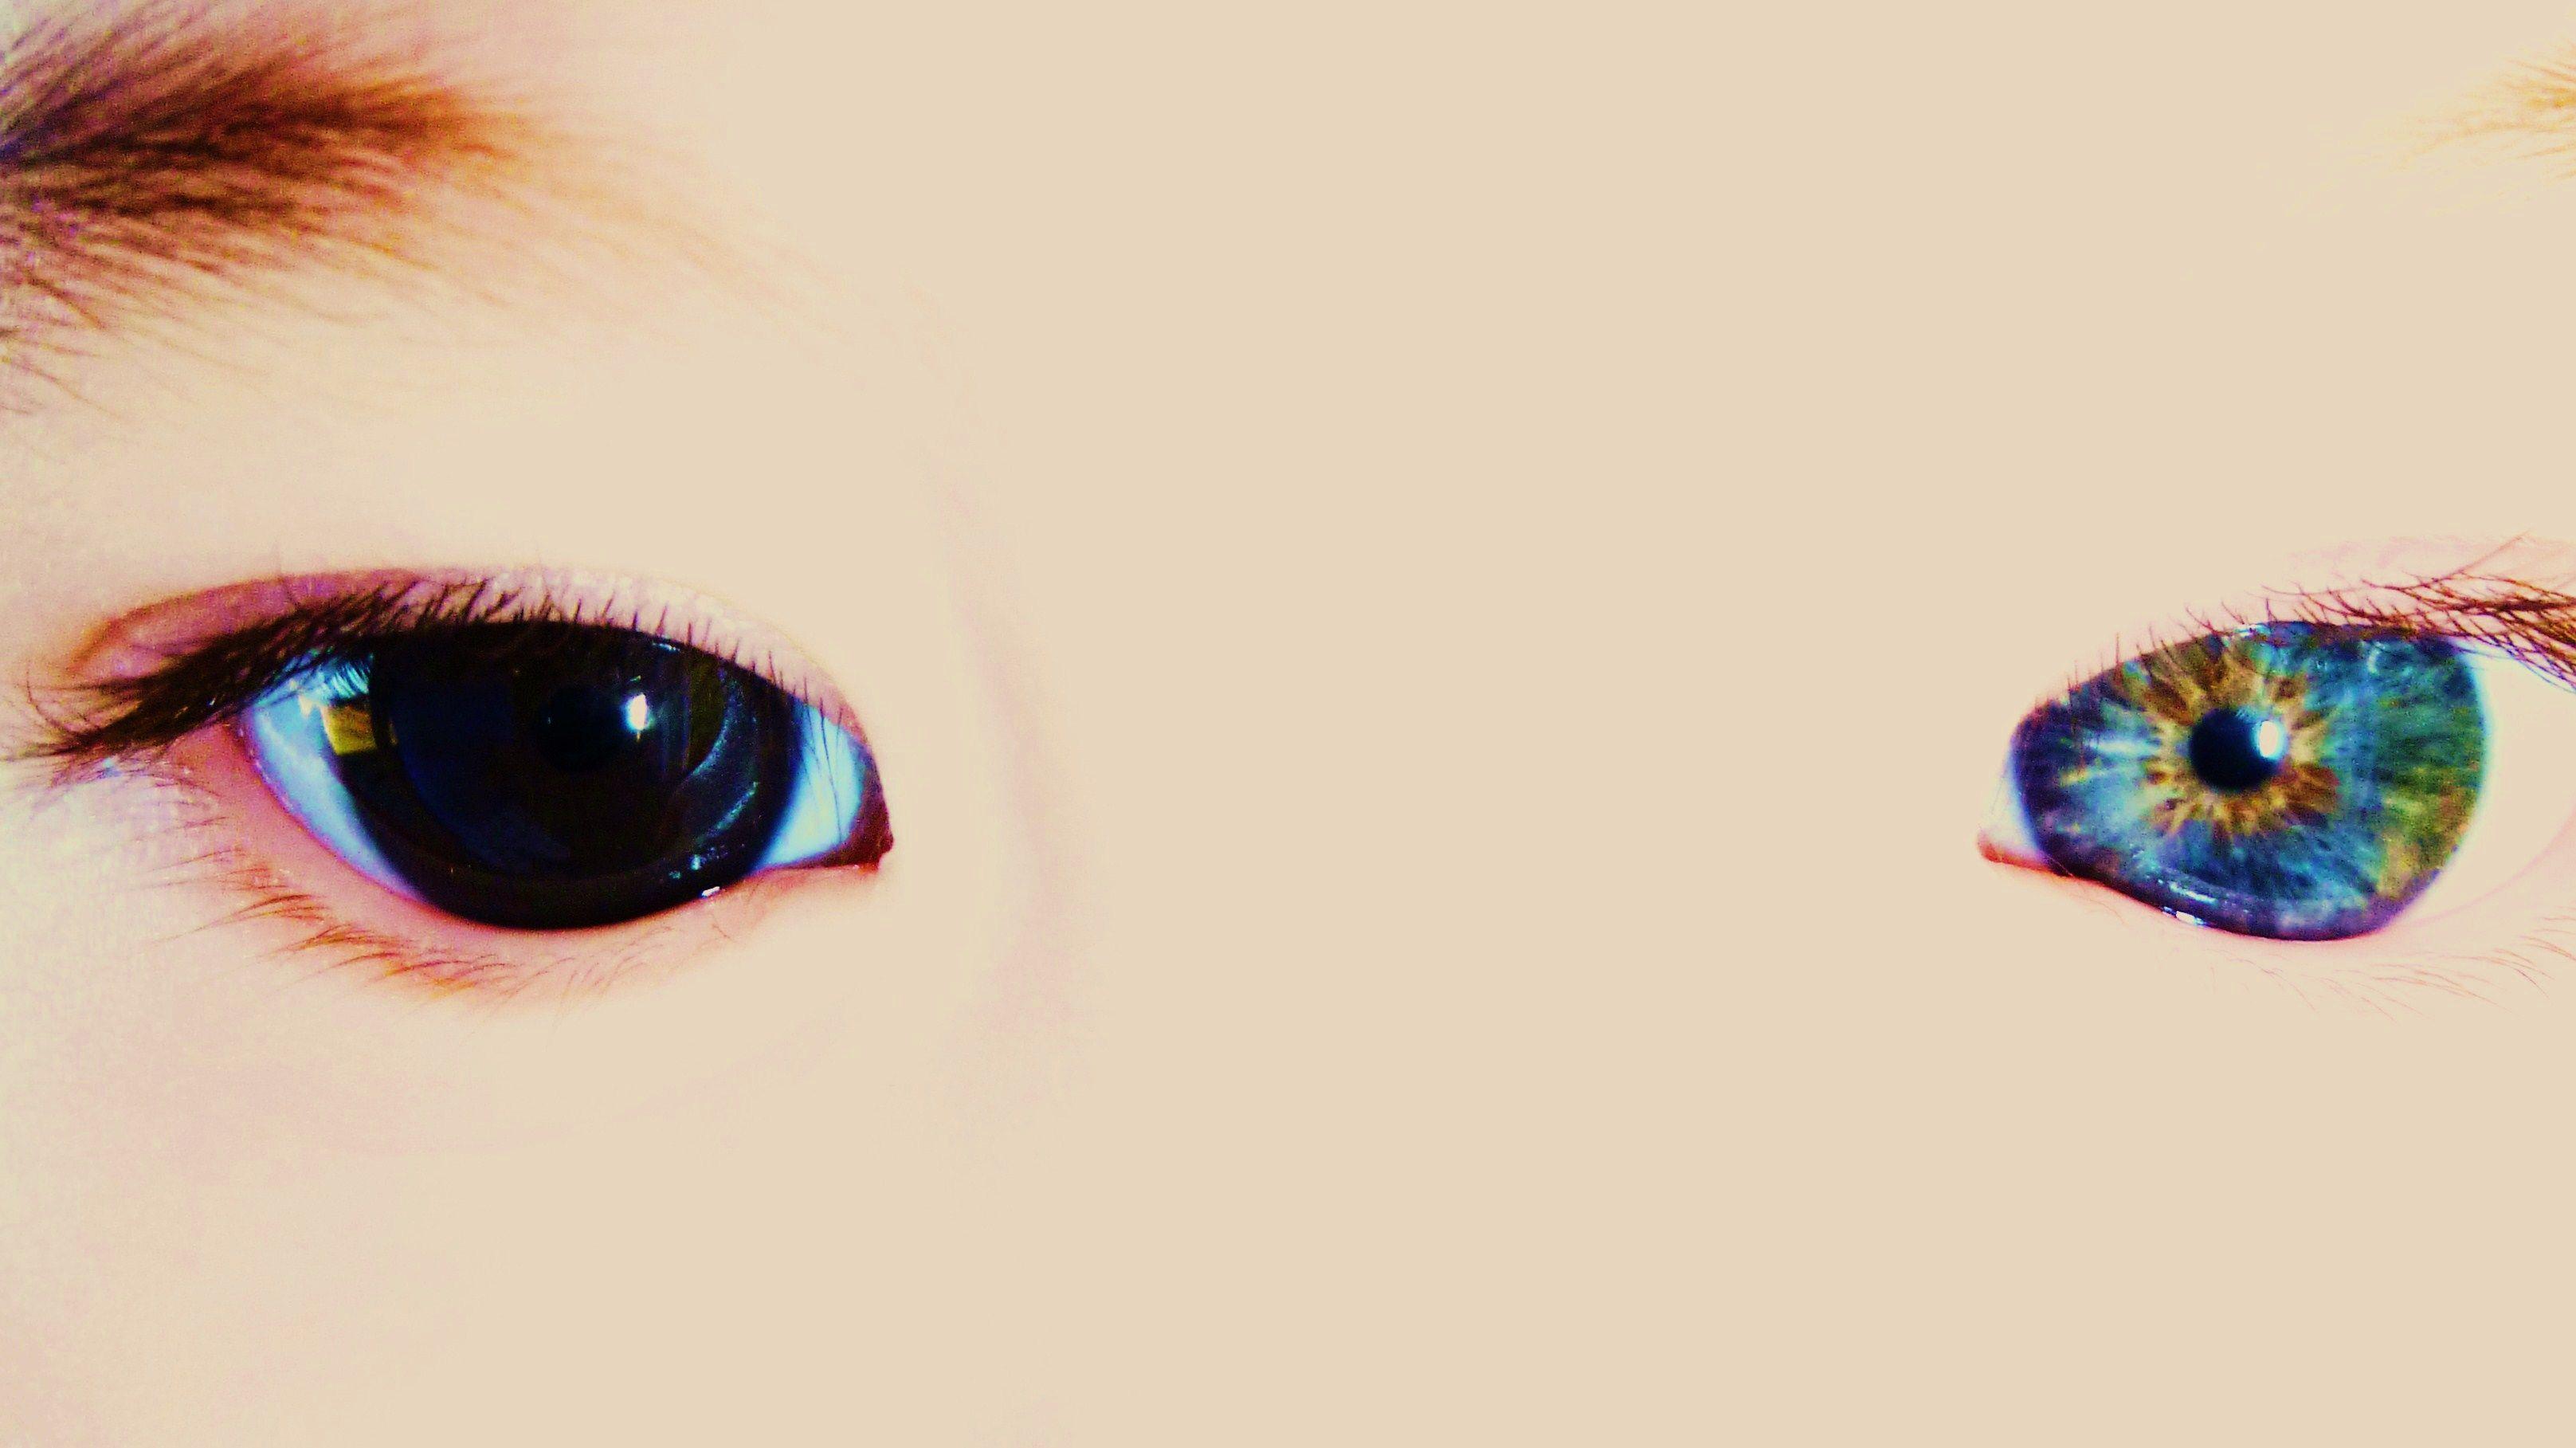 Case's eyes. I just change the brightness, tint, and saturation or the photo. Heterochromia iridum